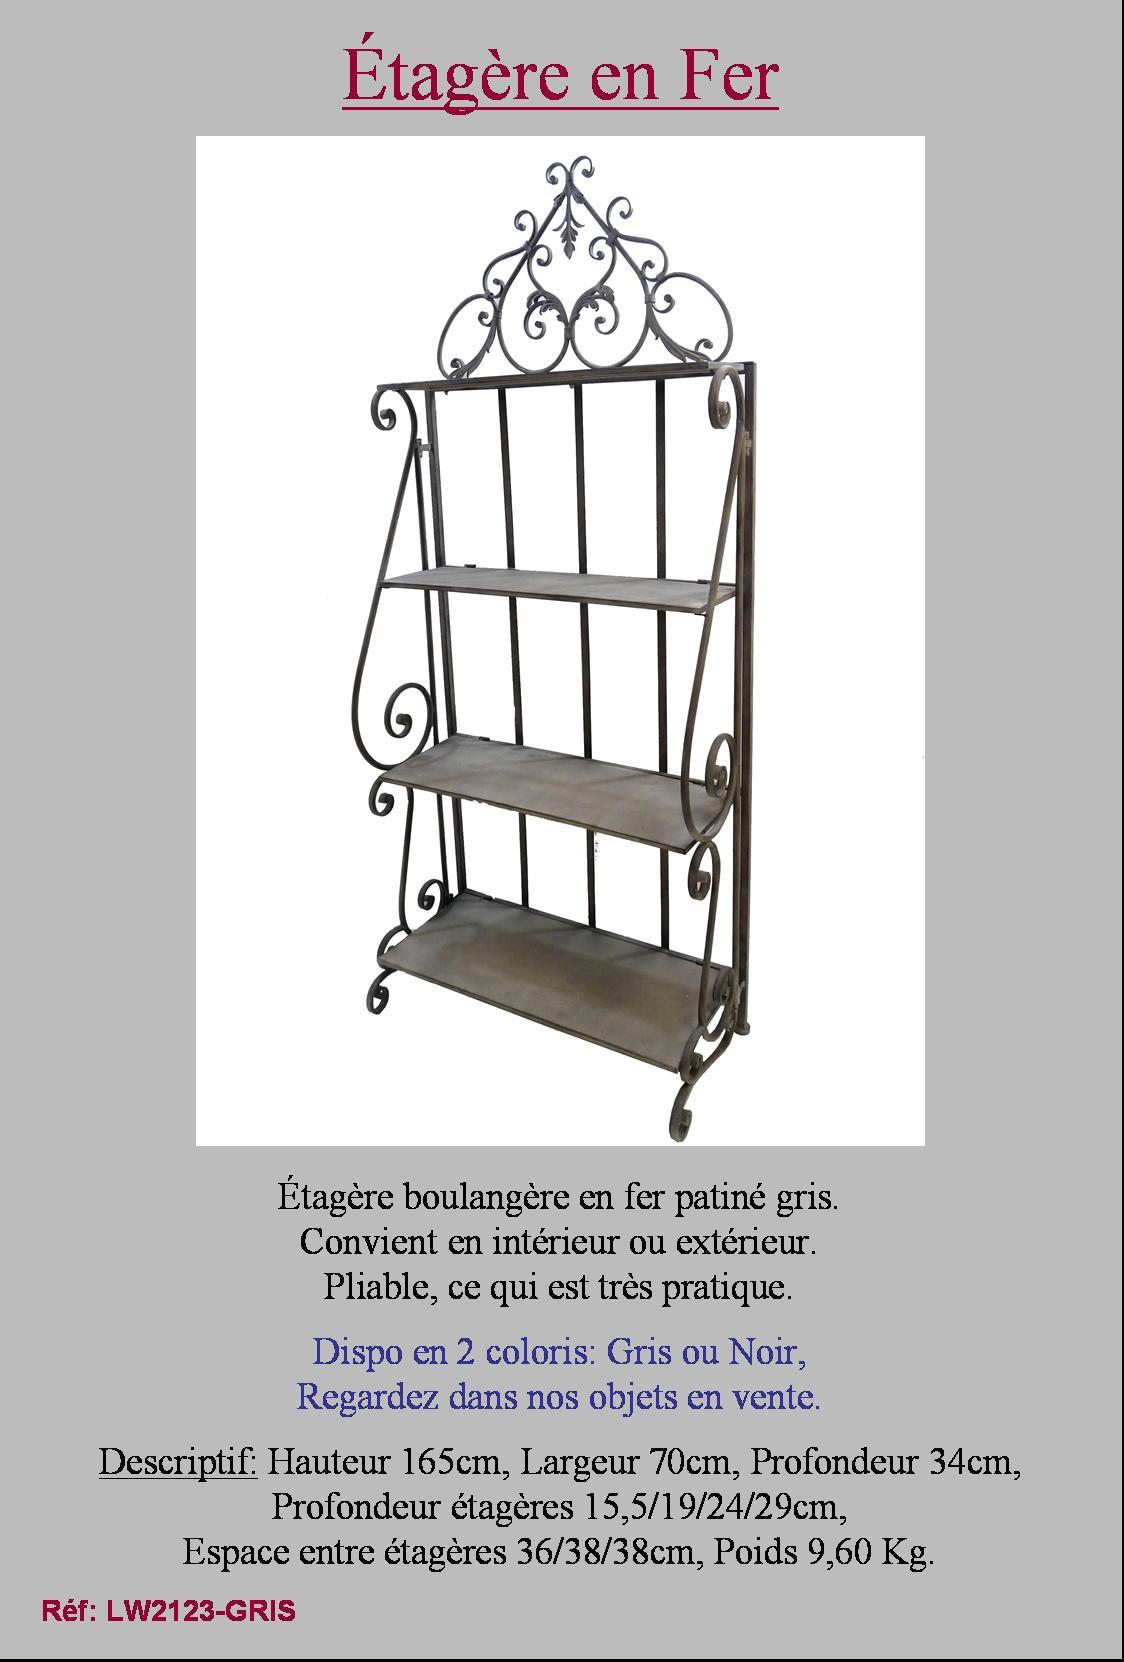 etagere boulangere bibliotheque en fer forg de salon cuisine salle de bain ebay. Black Bedroom Furniture Sets. Home Design Ideas